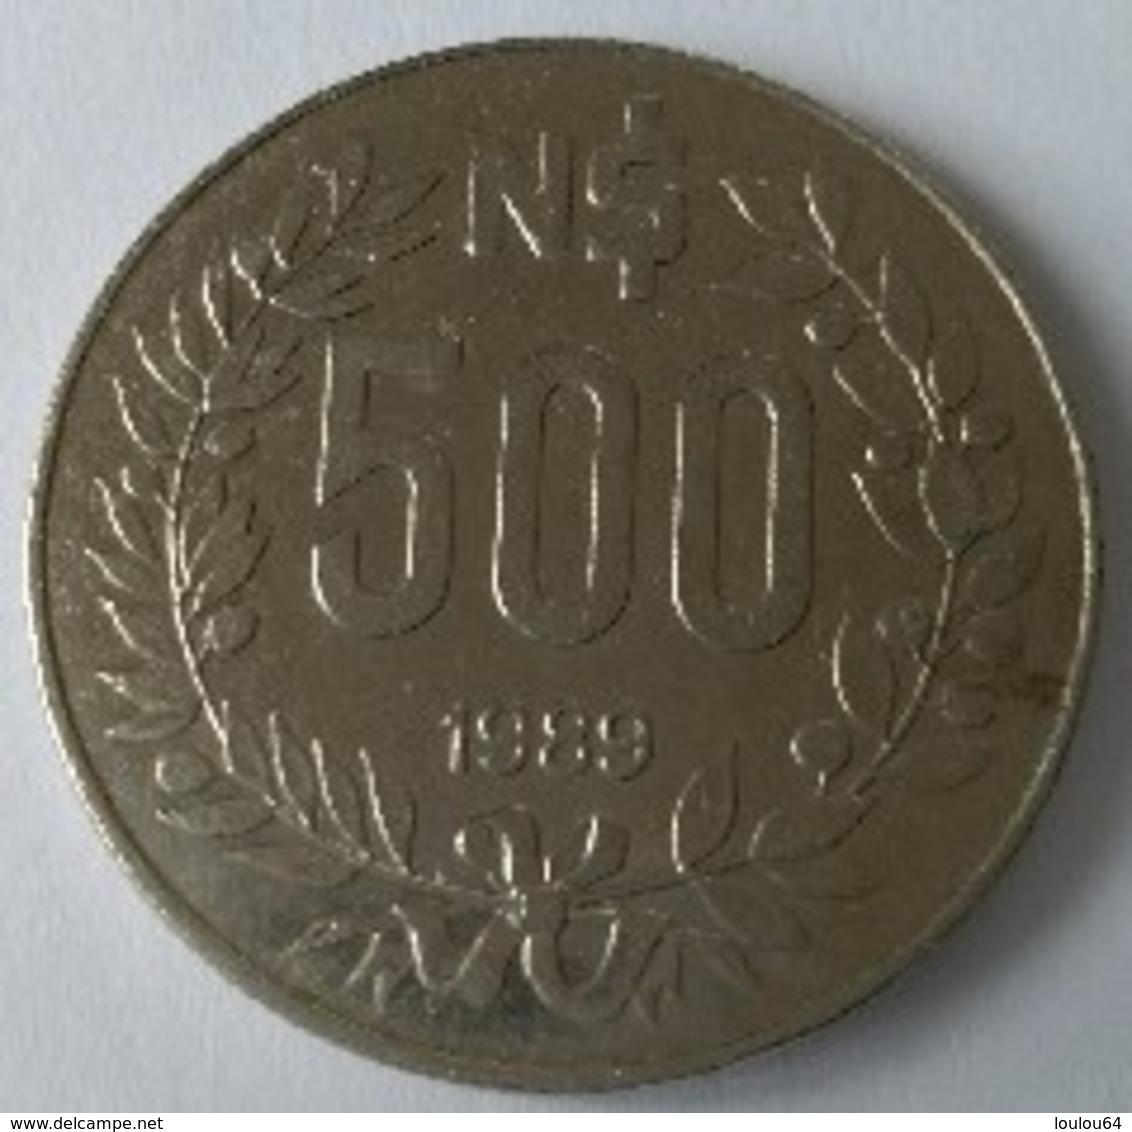 URUGUAY - 500 Nouveaux Pesos 1989 - ARTIGAS - - Uruguay